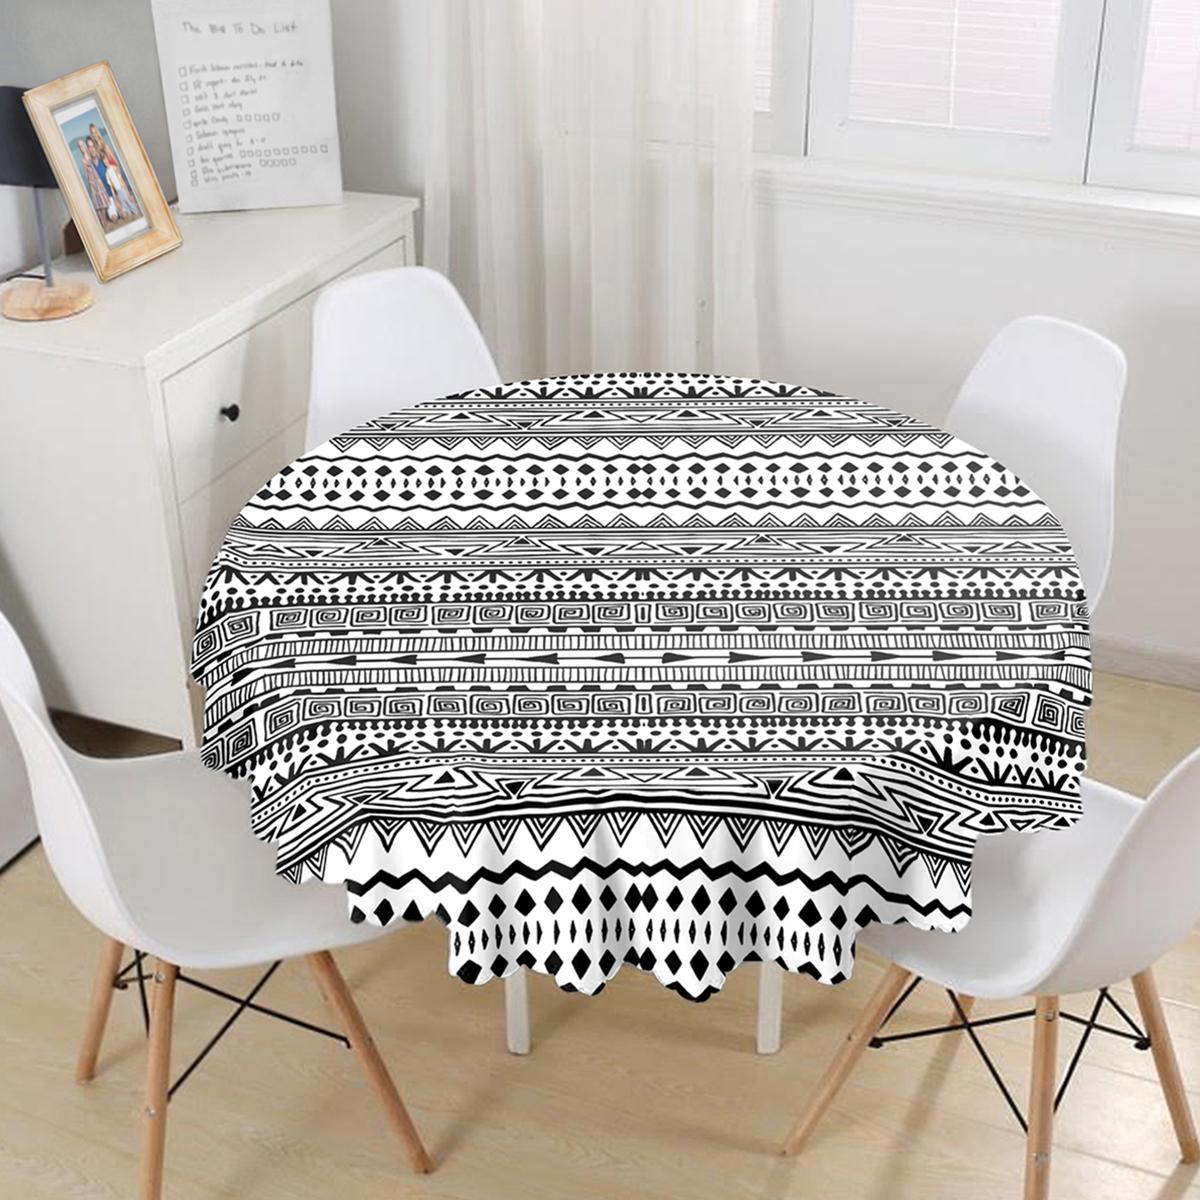 Siyah Beyaz African Motifli Modern Yuvarlak Masa Örtüsü - Çap 140cm Realhomes